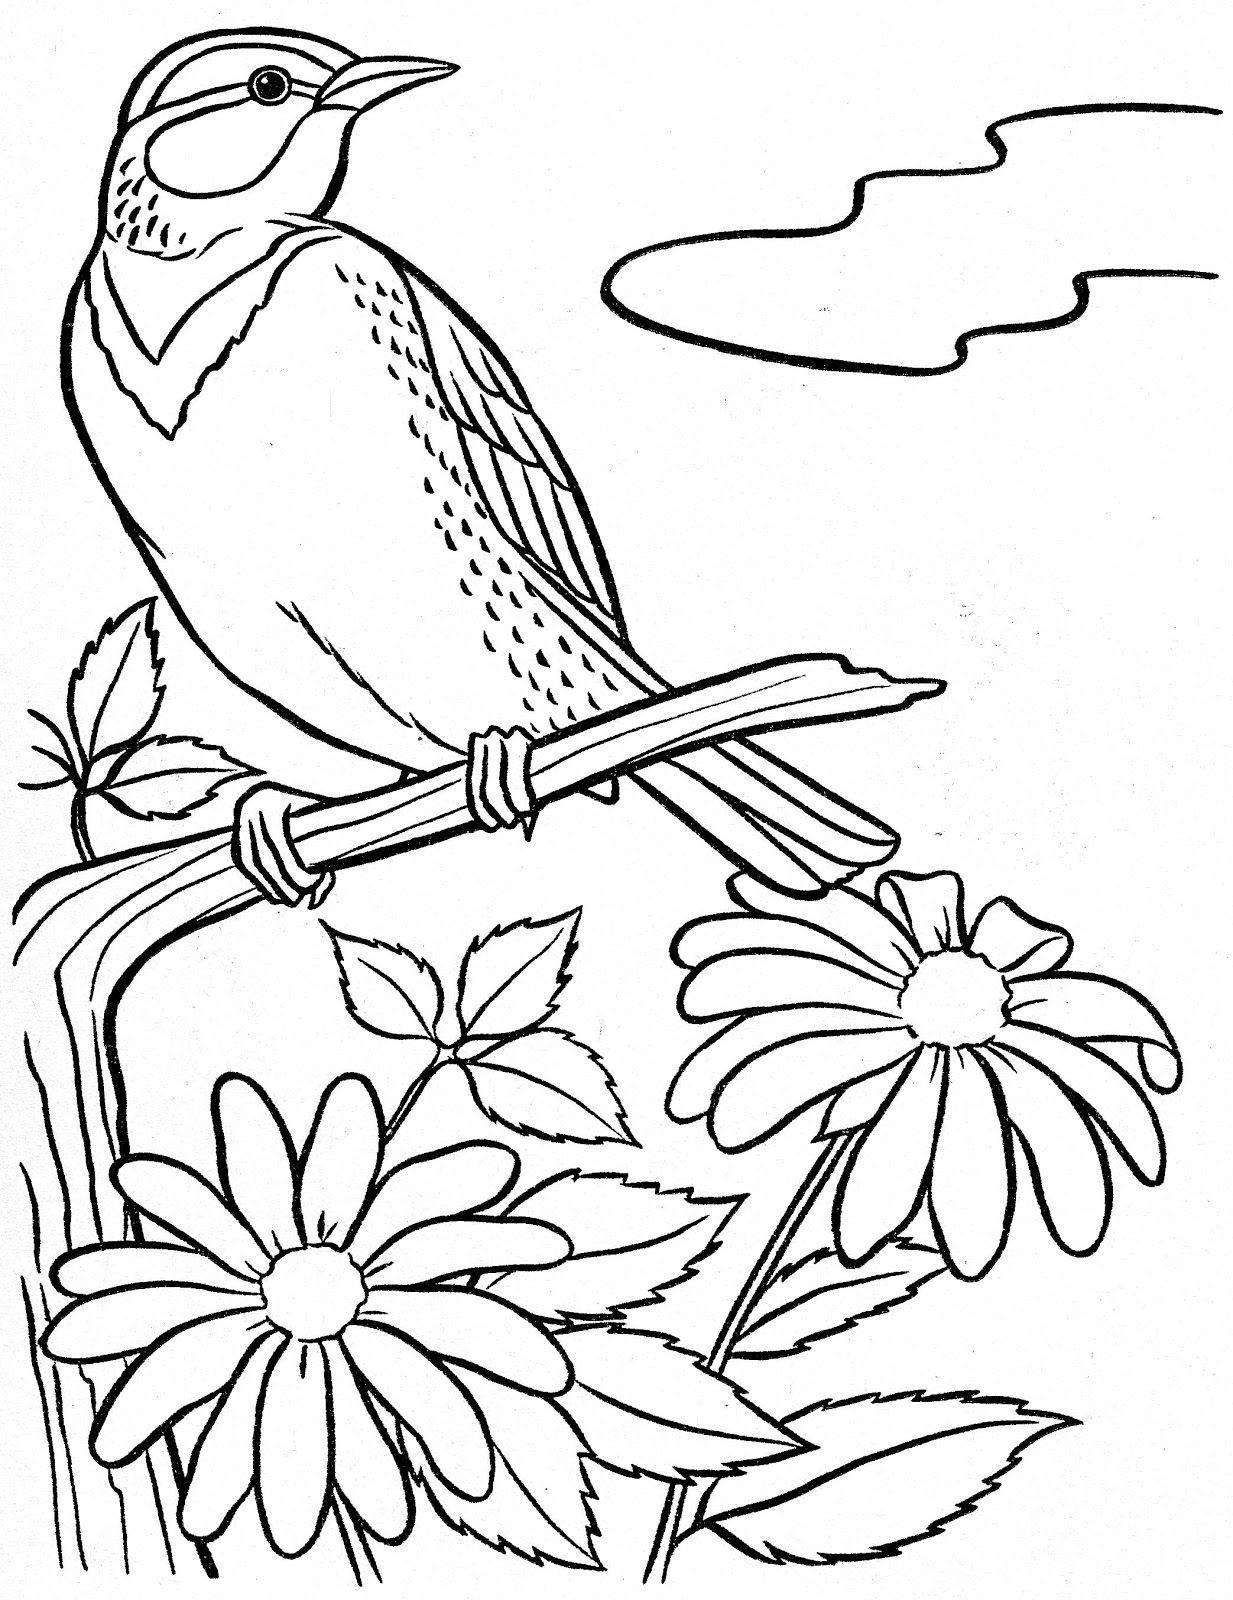 Desenhos para Colorir de Pássaro   Pajaros   Pinterest   Pájaro ...